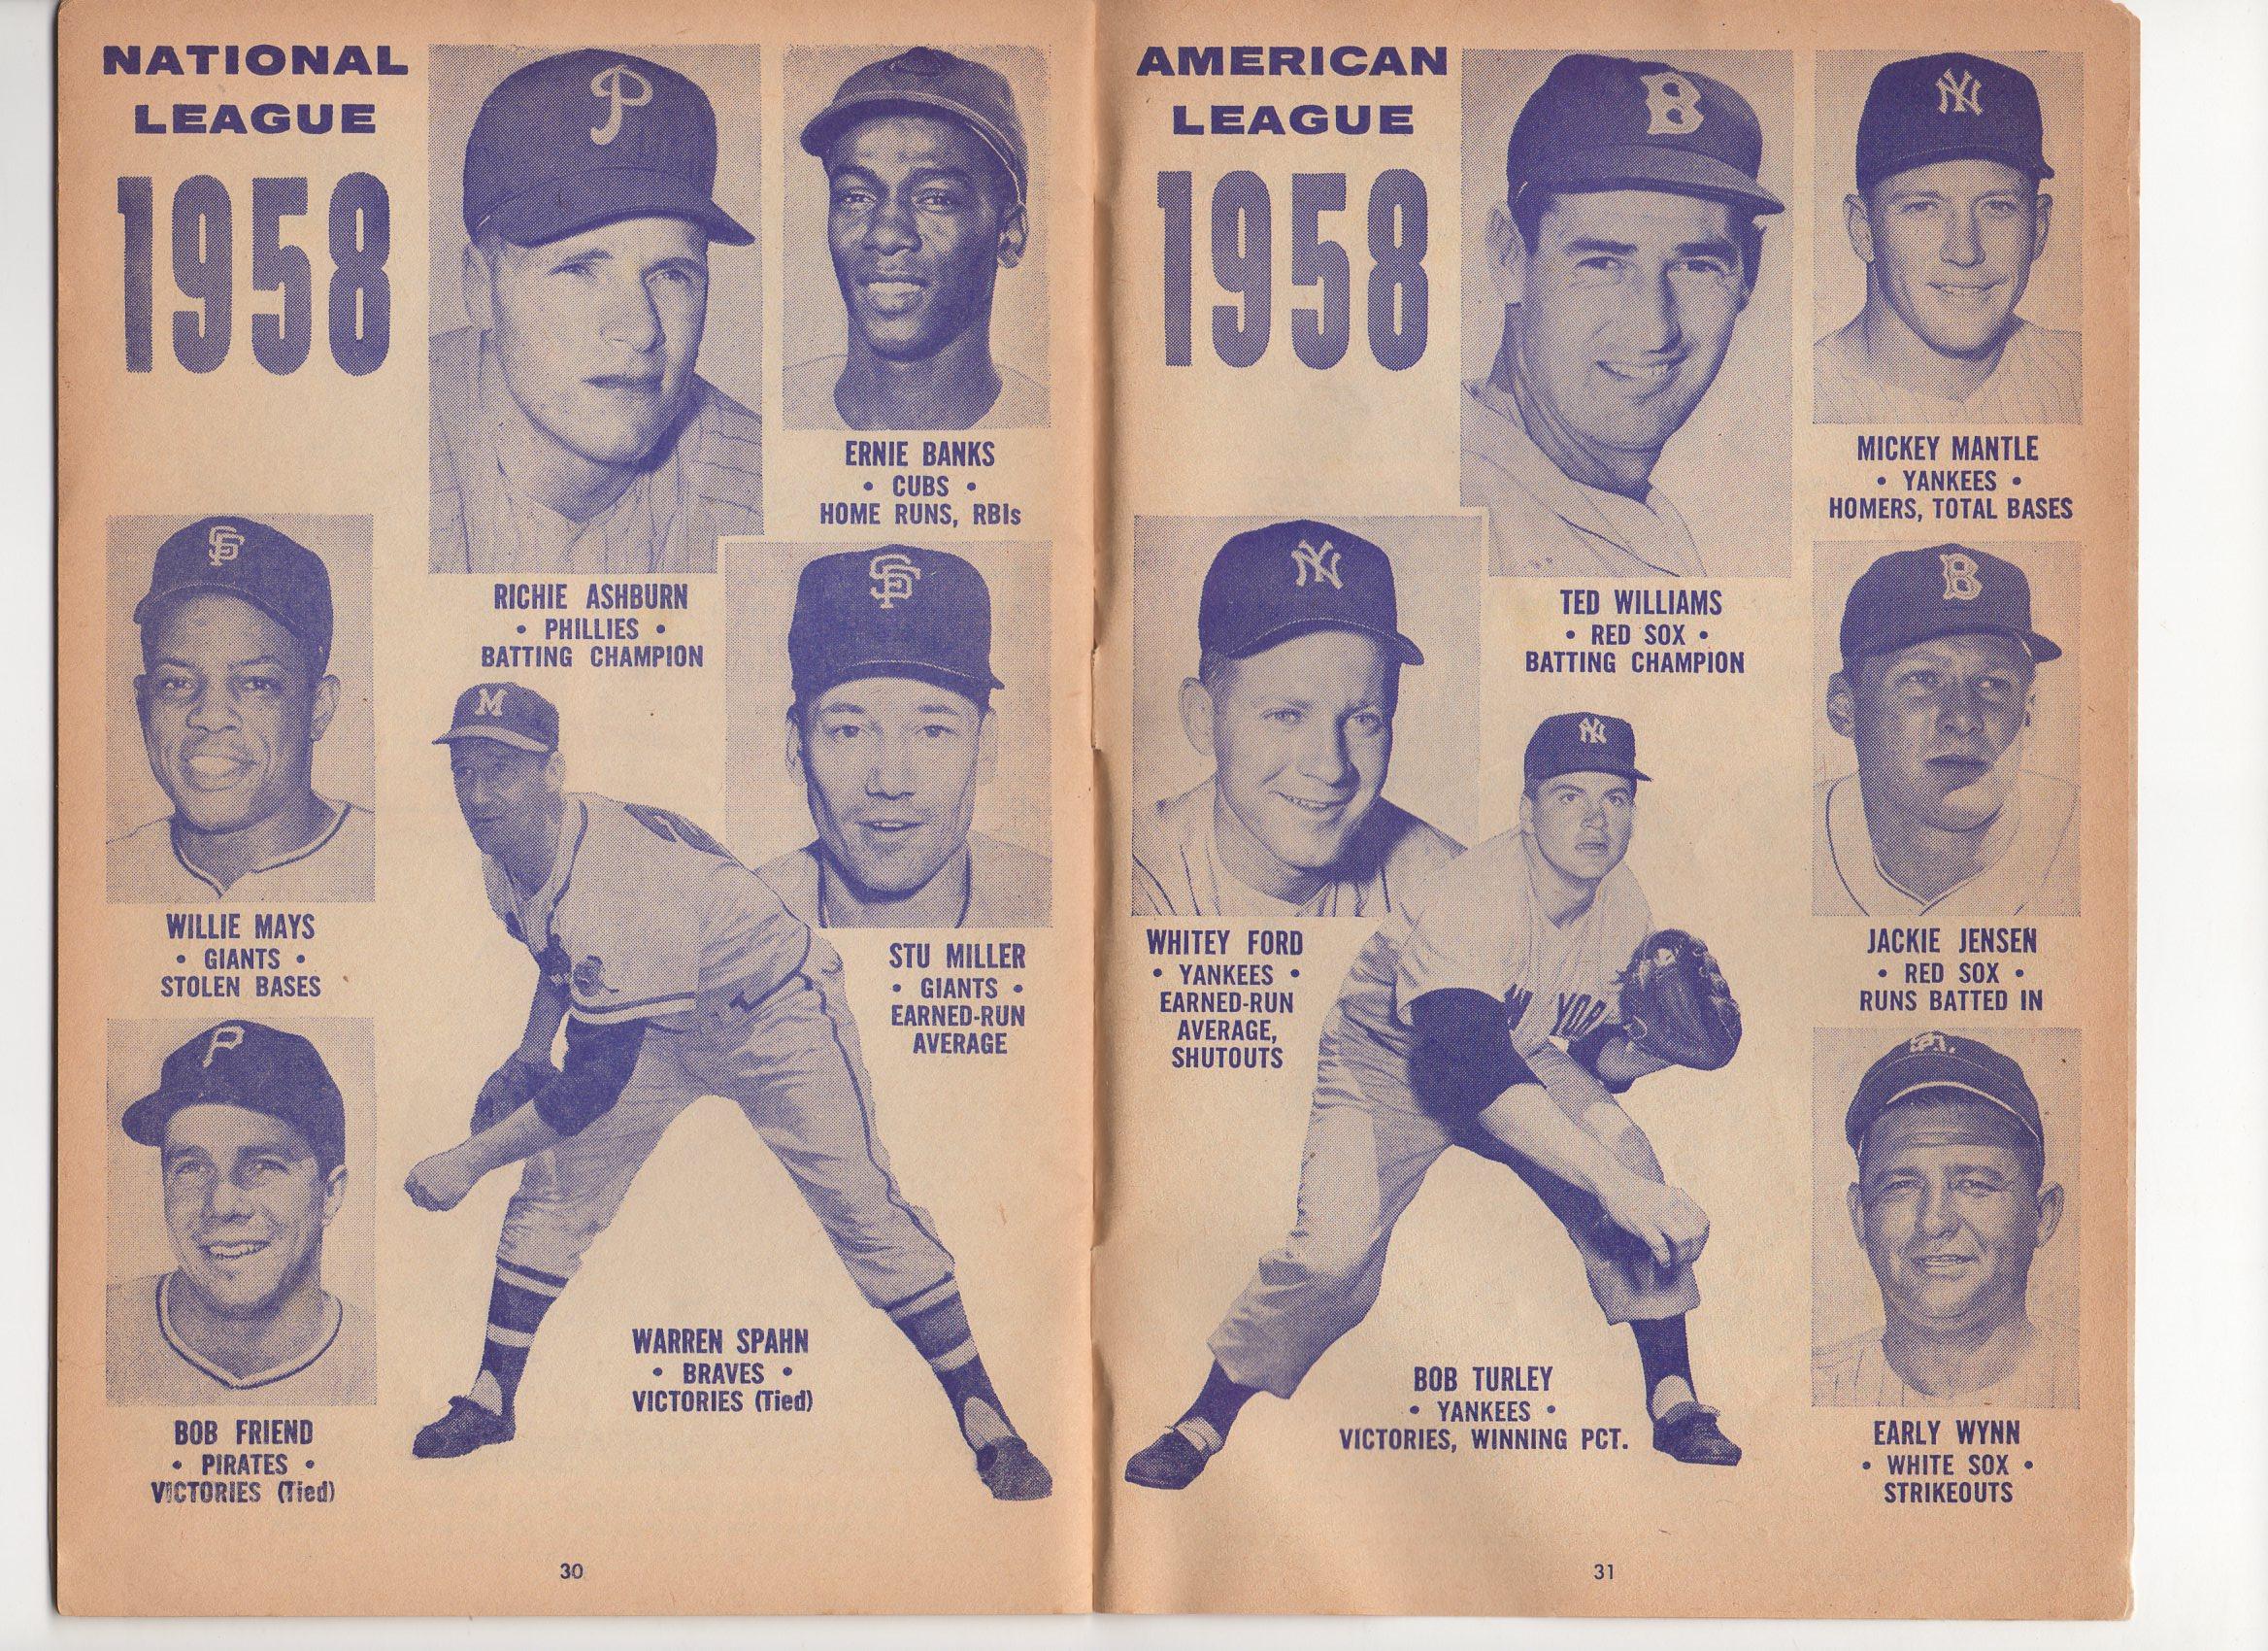 1959 daystrom-weston baseball, the great american game